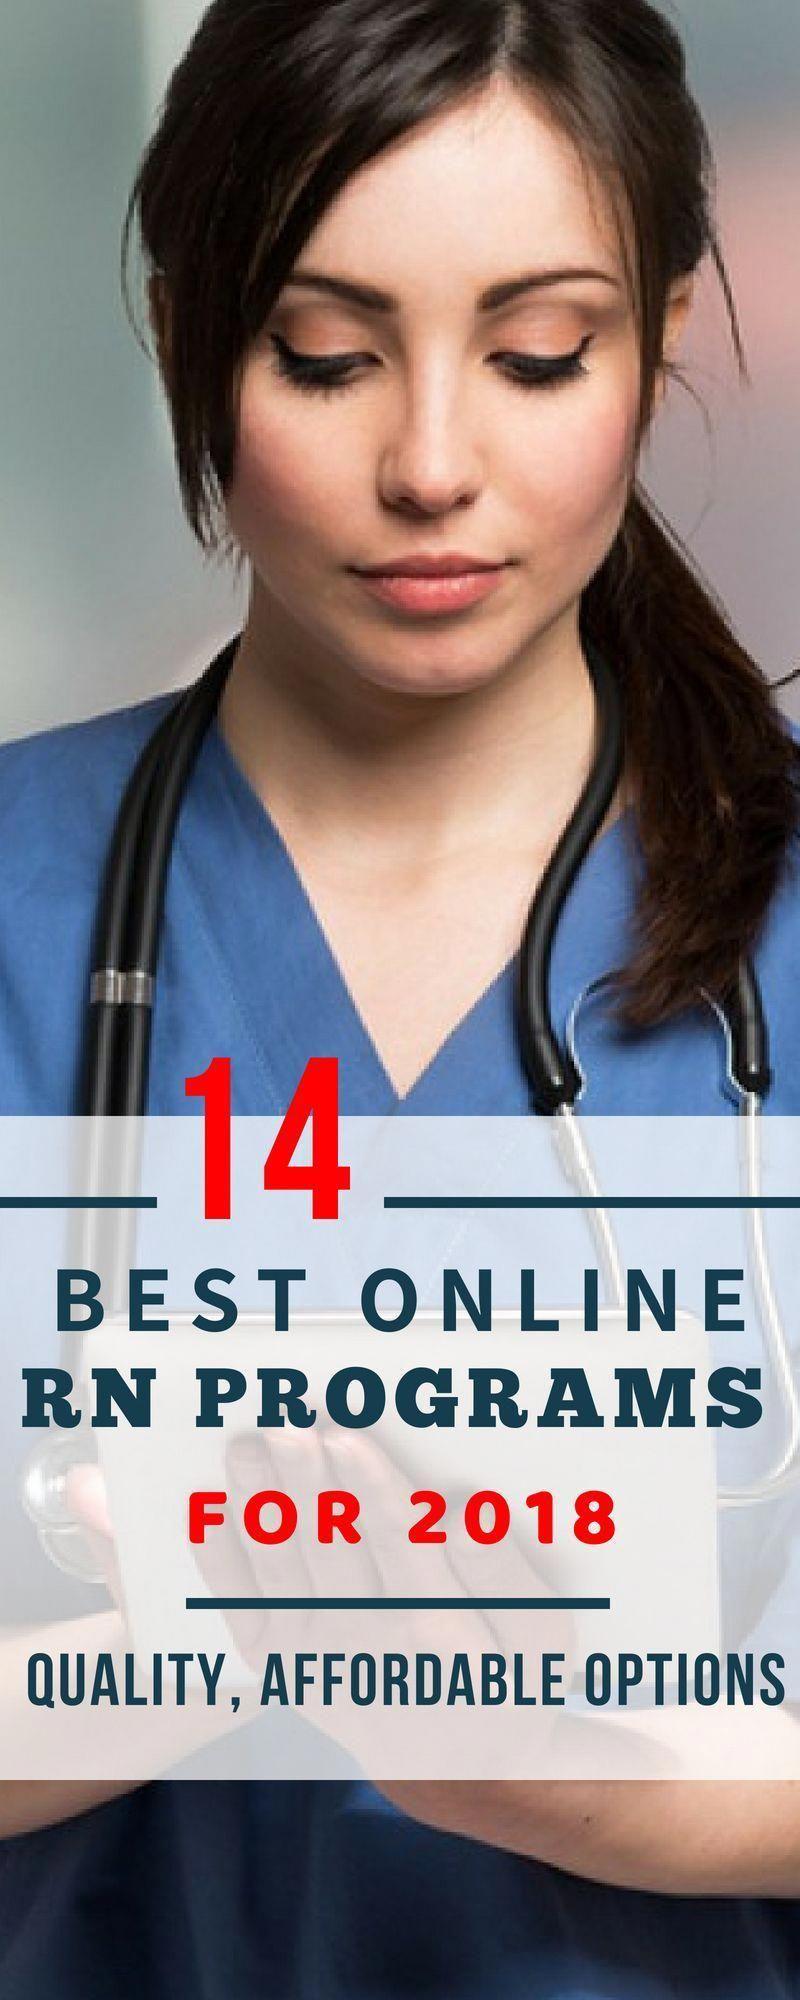 Nursing home jobs near me bestnursingschools online rn